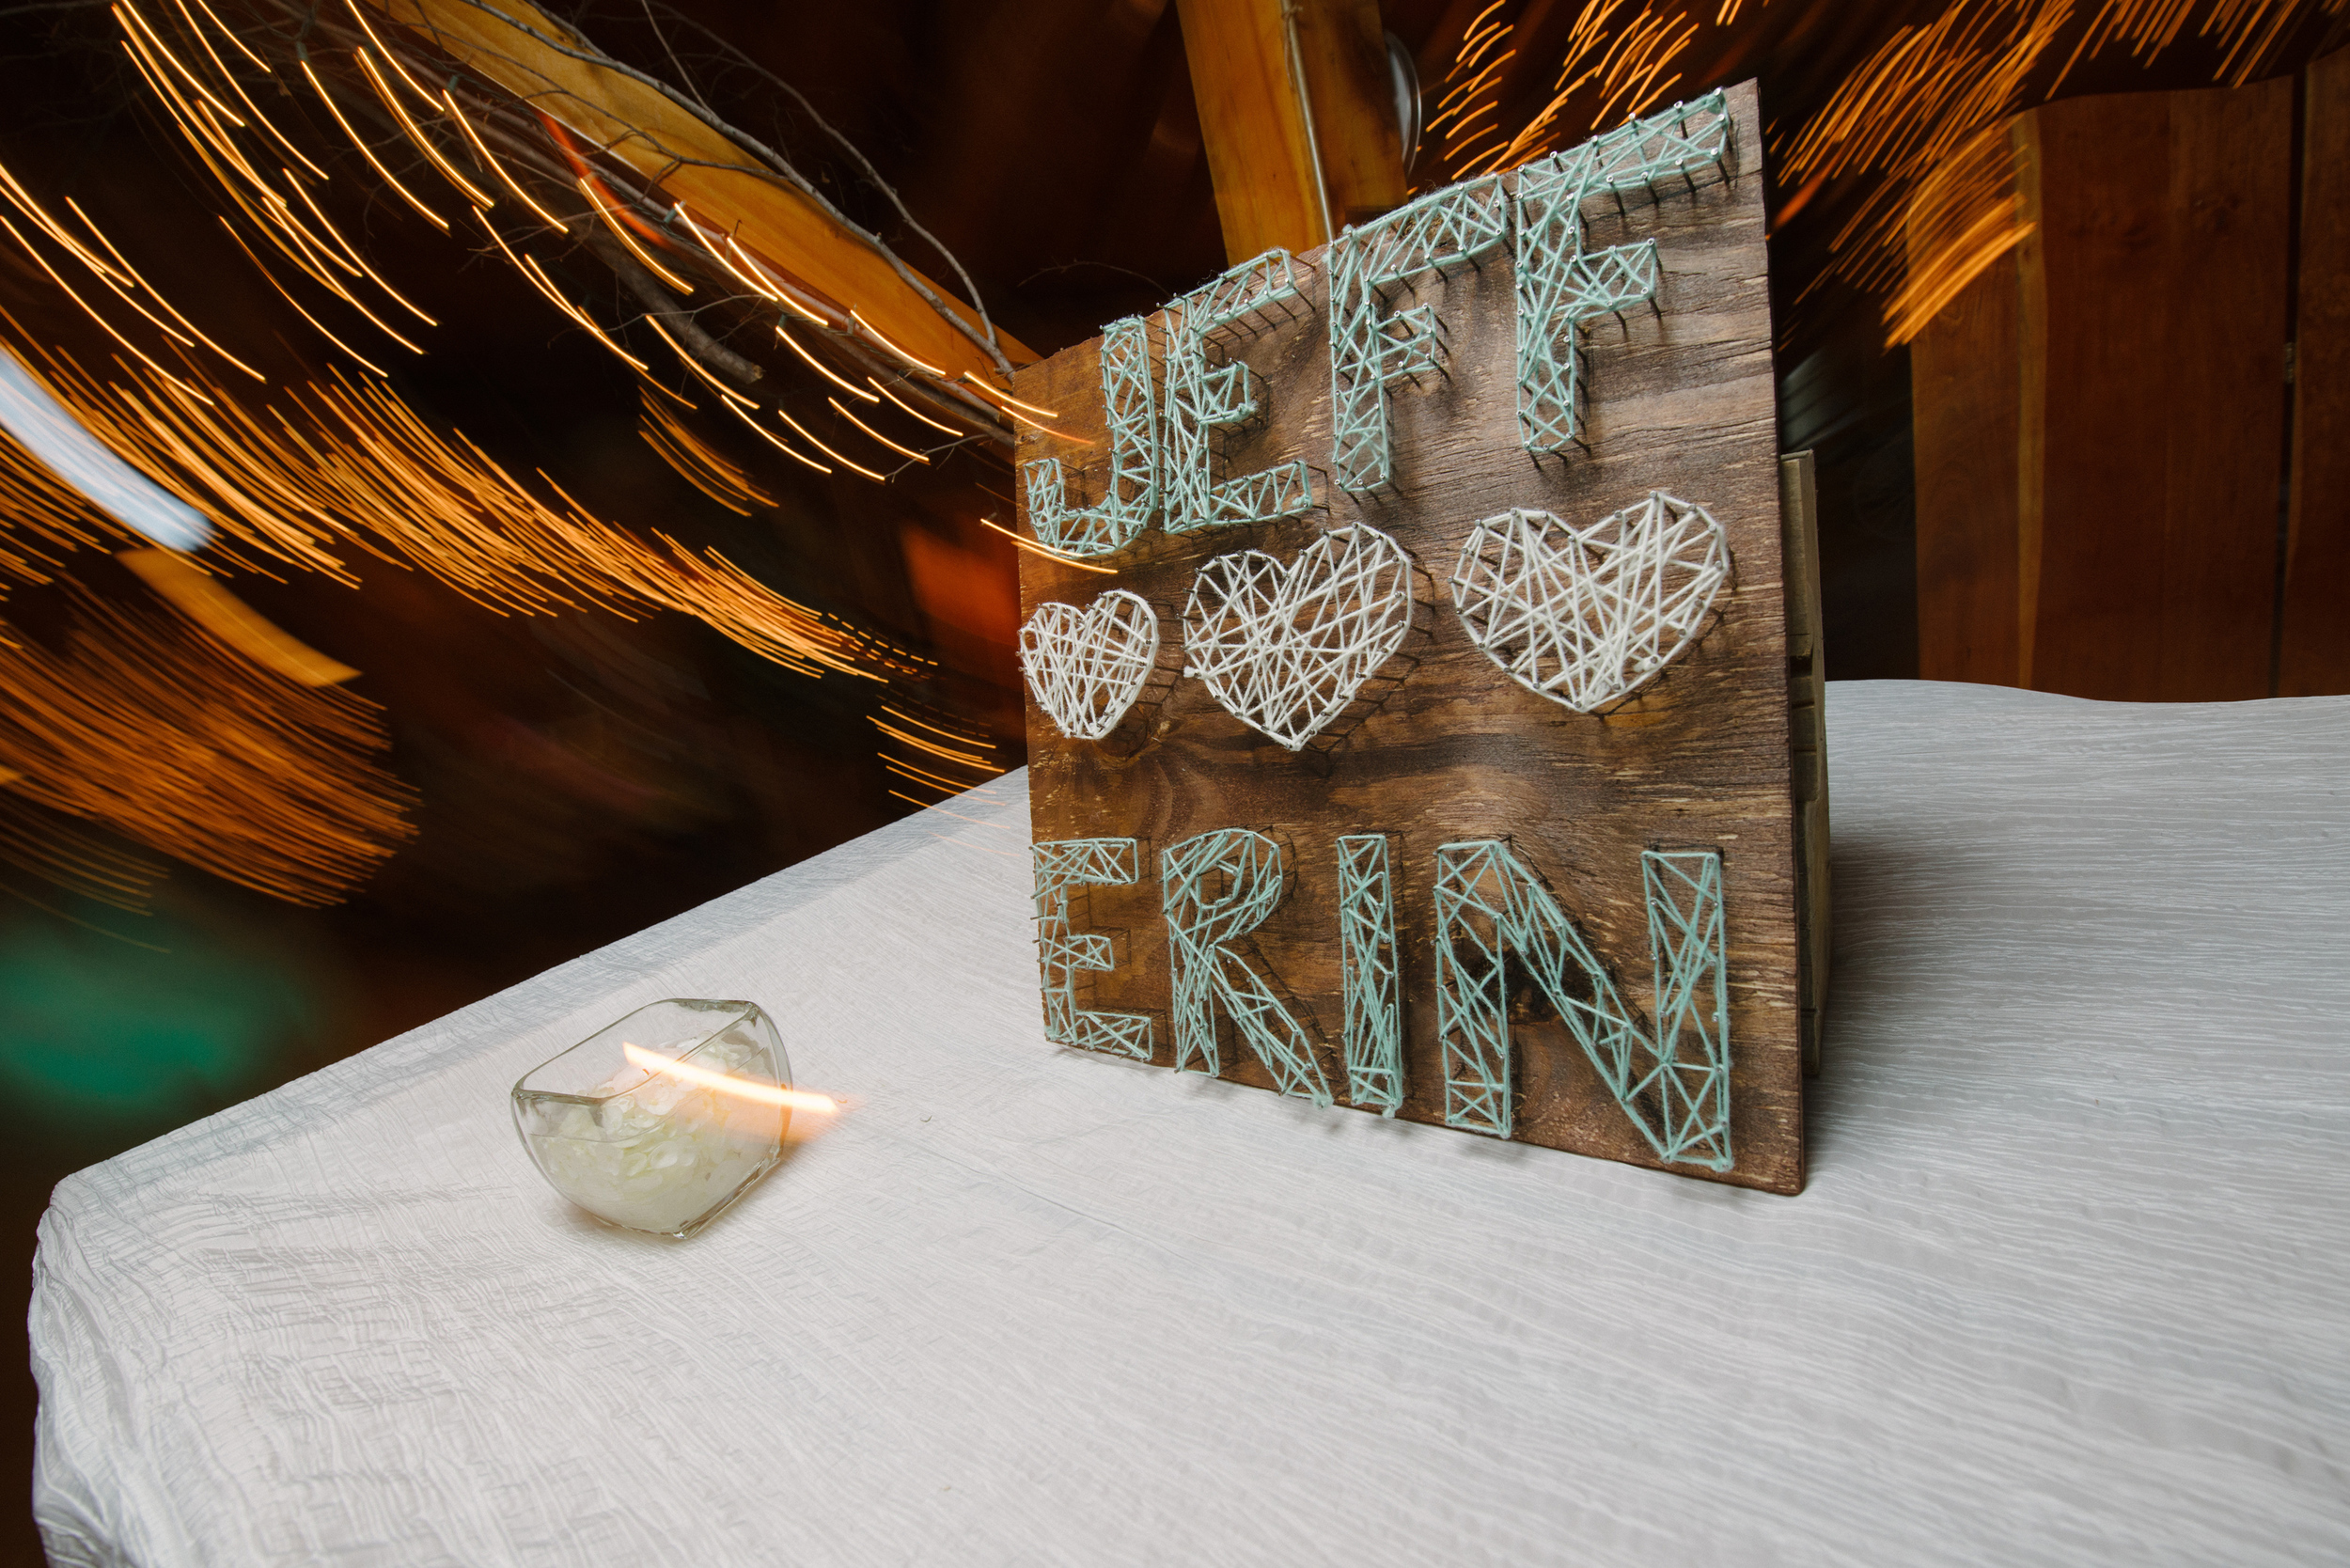 Matt_Swetel_Photography_Erin_and_Jeff_married001.jpg